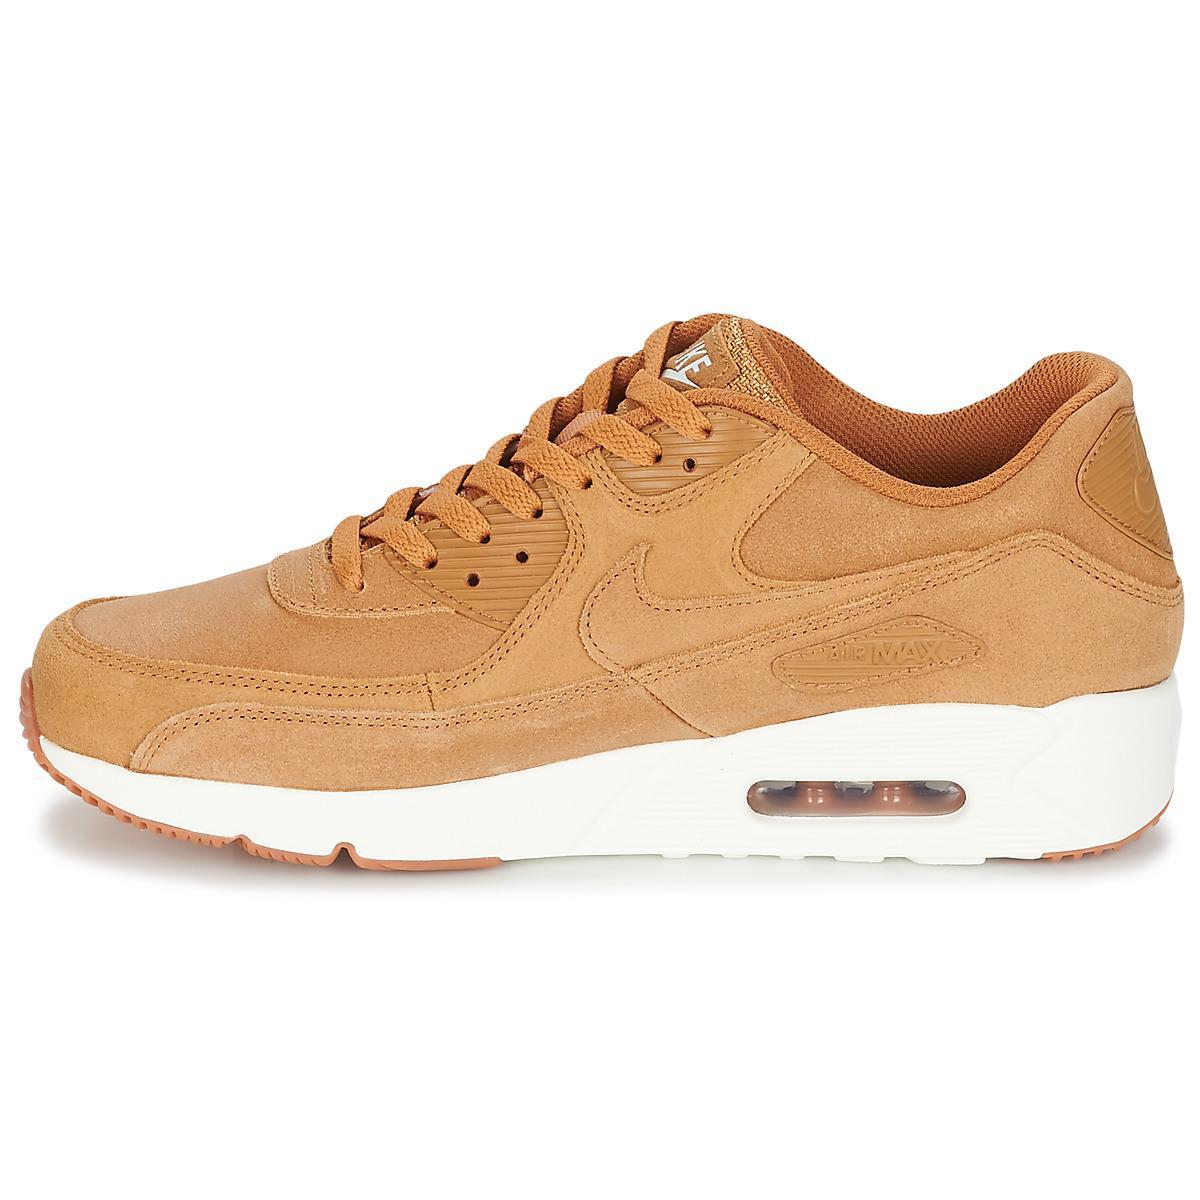 Nike Leather Air Max 90 Ultra 2.0 Ltr Gymnastics Shoes, Beige Wheat/lt Bone/gum Med Black/ale Brown 700, 6 Uk in Natural for Men